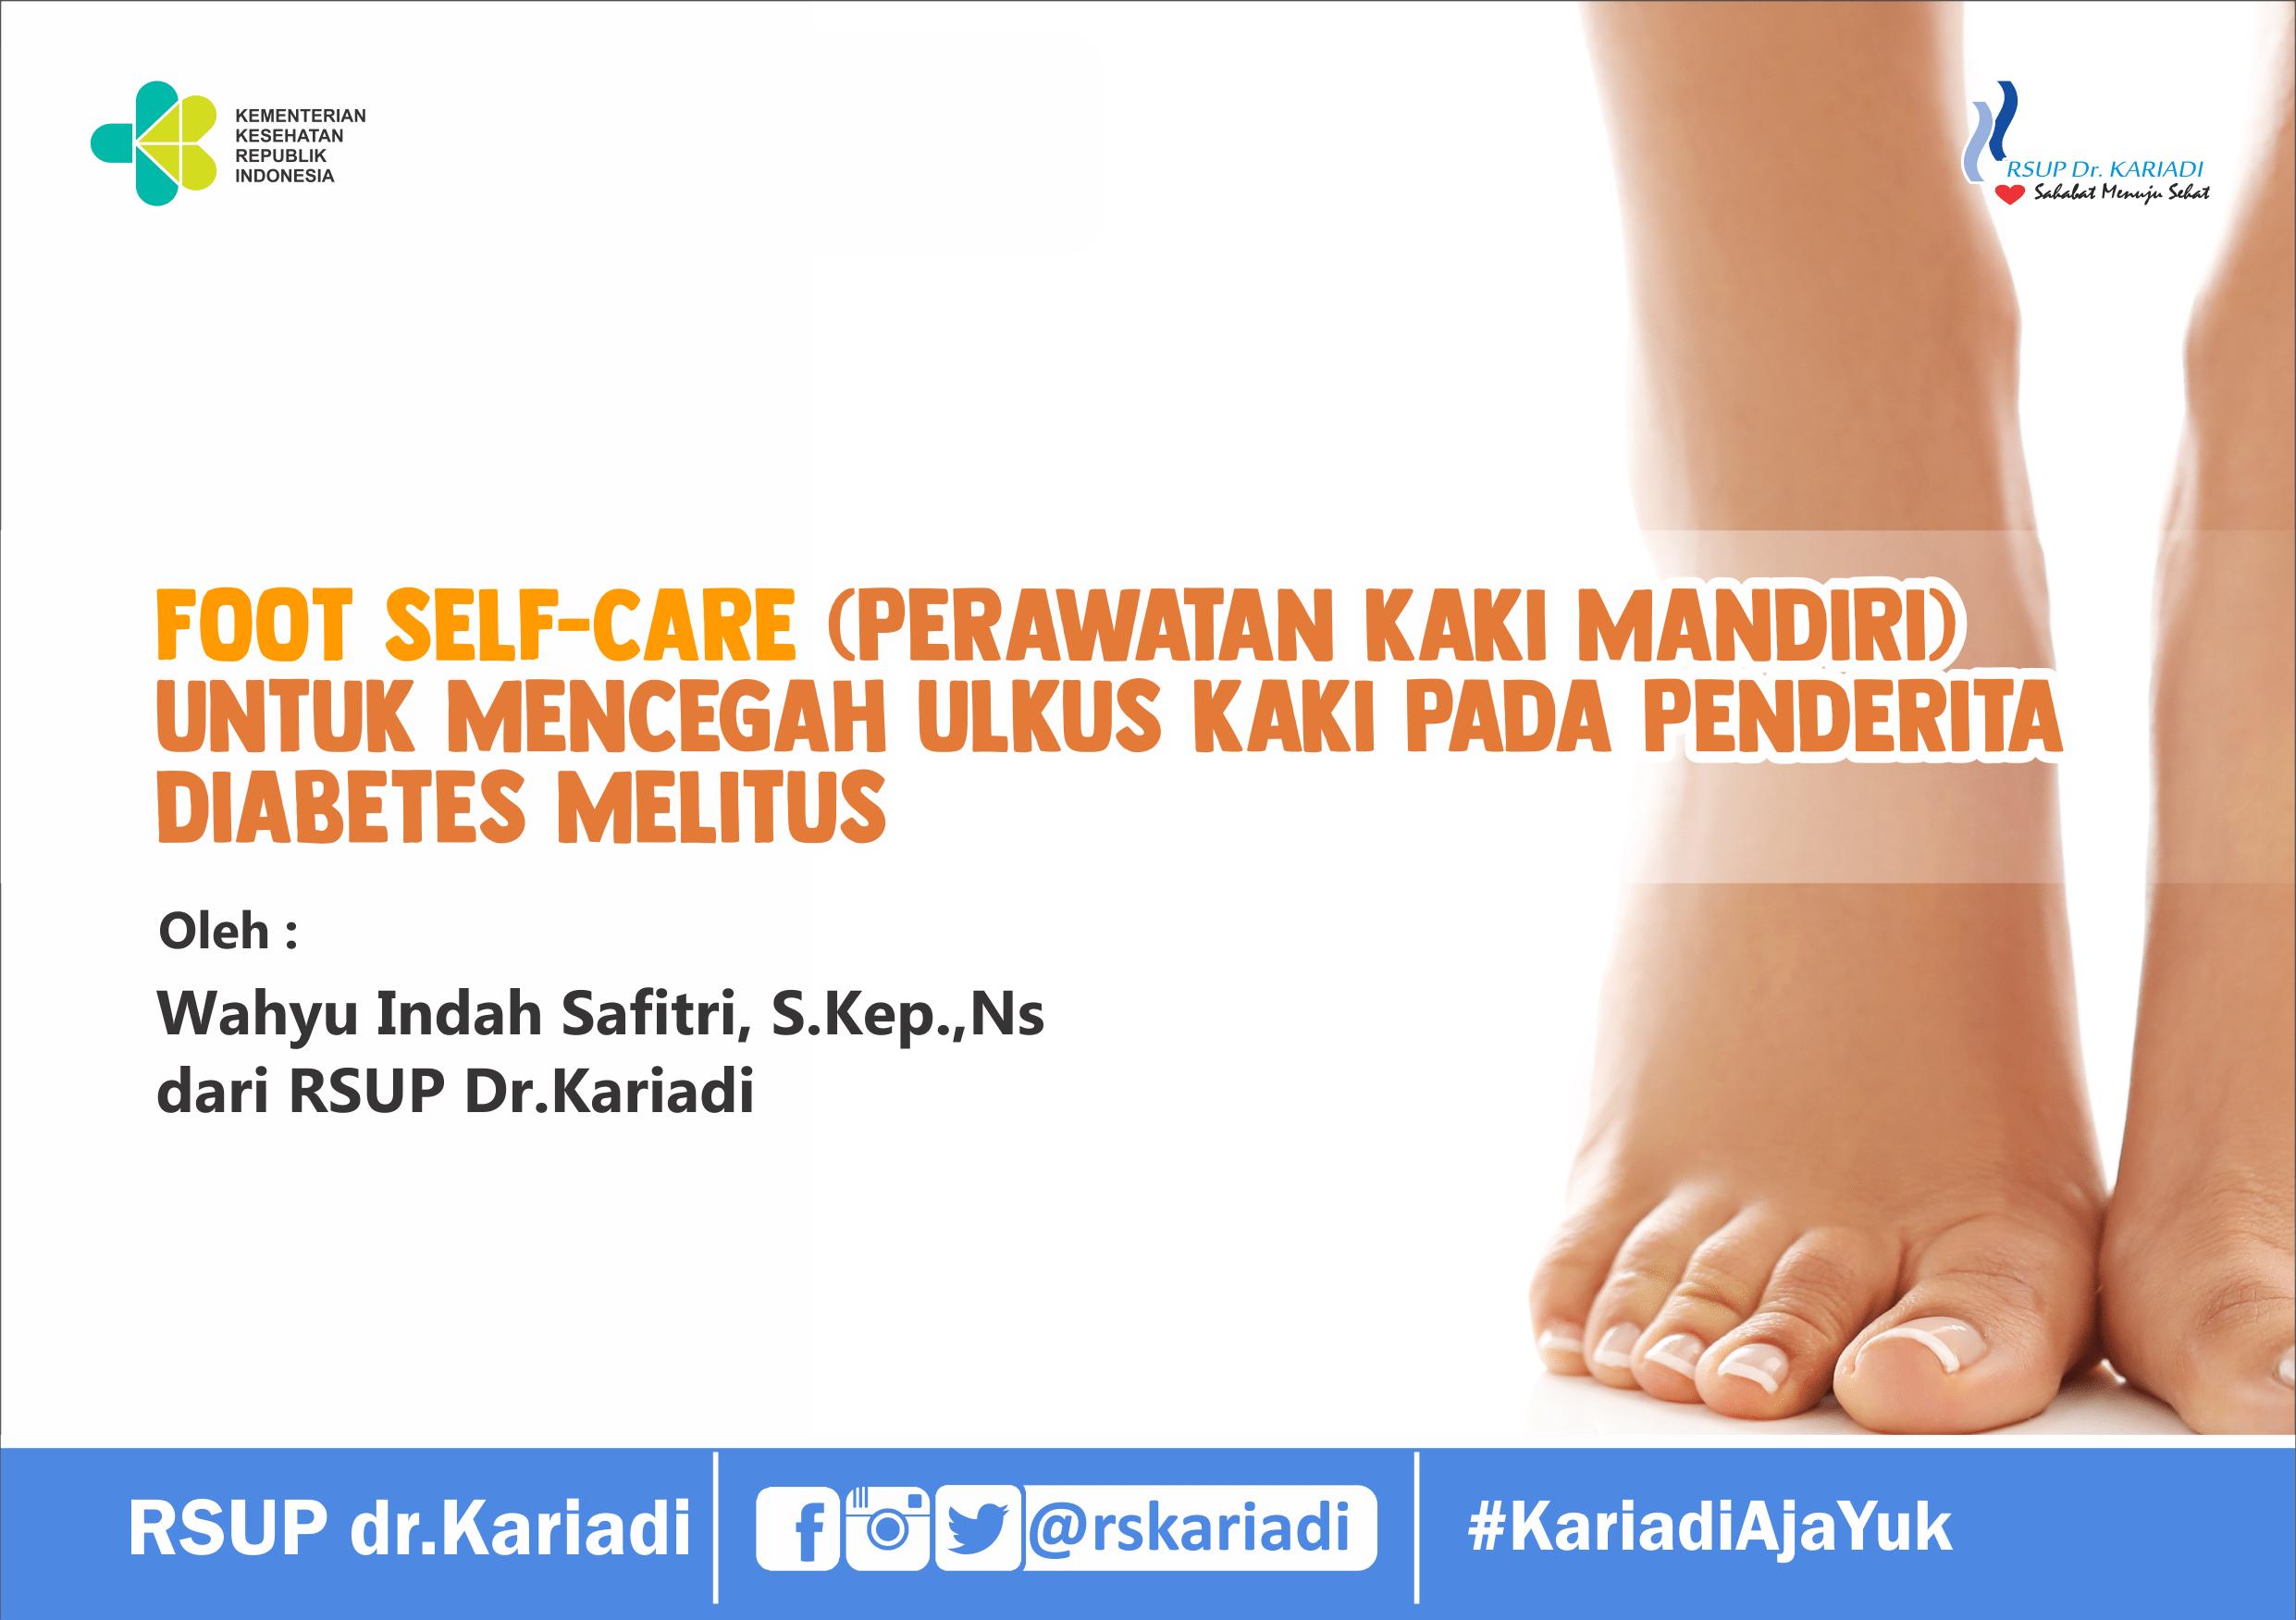 Foot Self Care Cegah Ulkus Kaki Diabetes